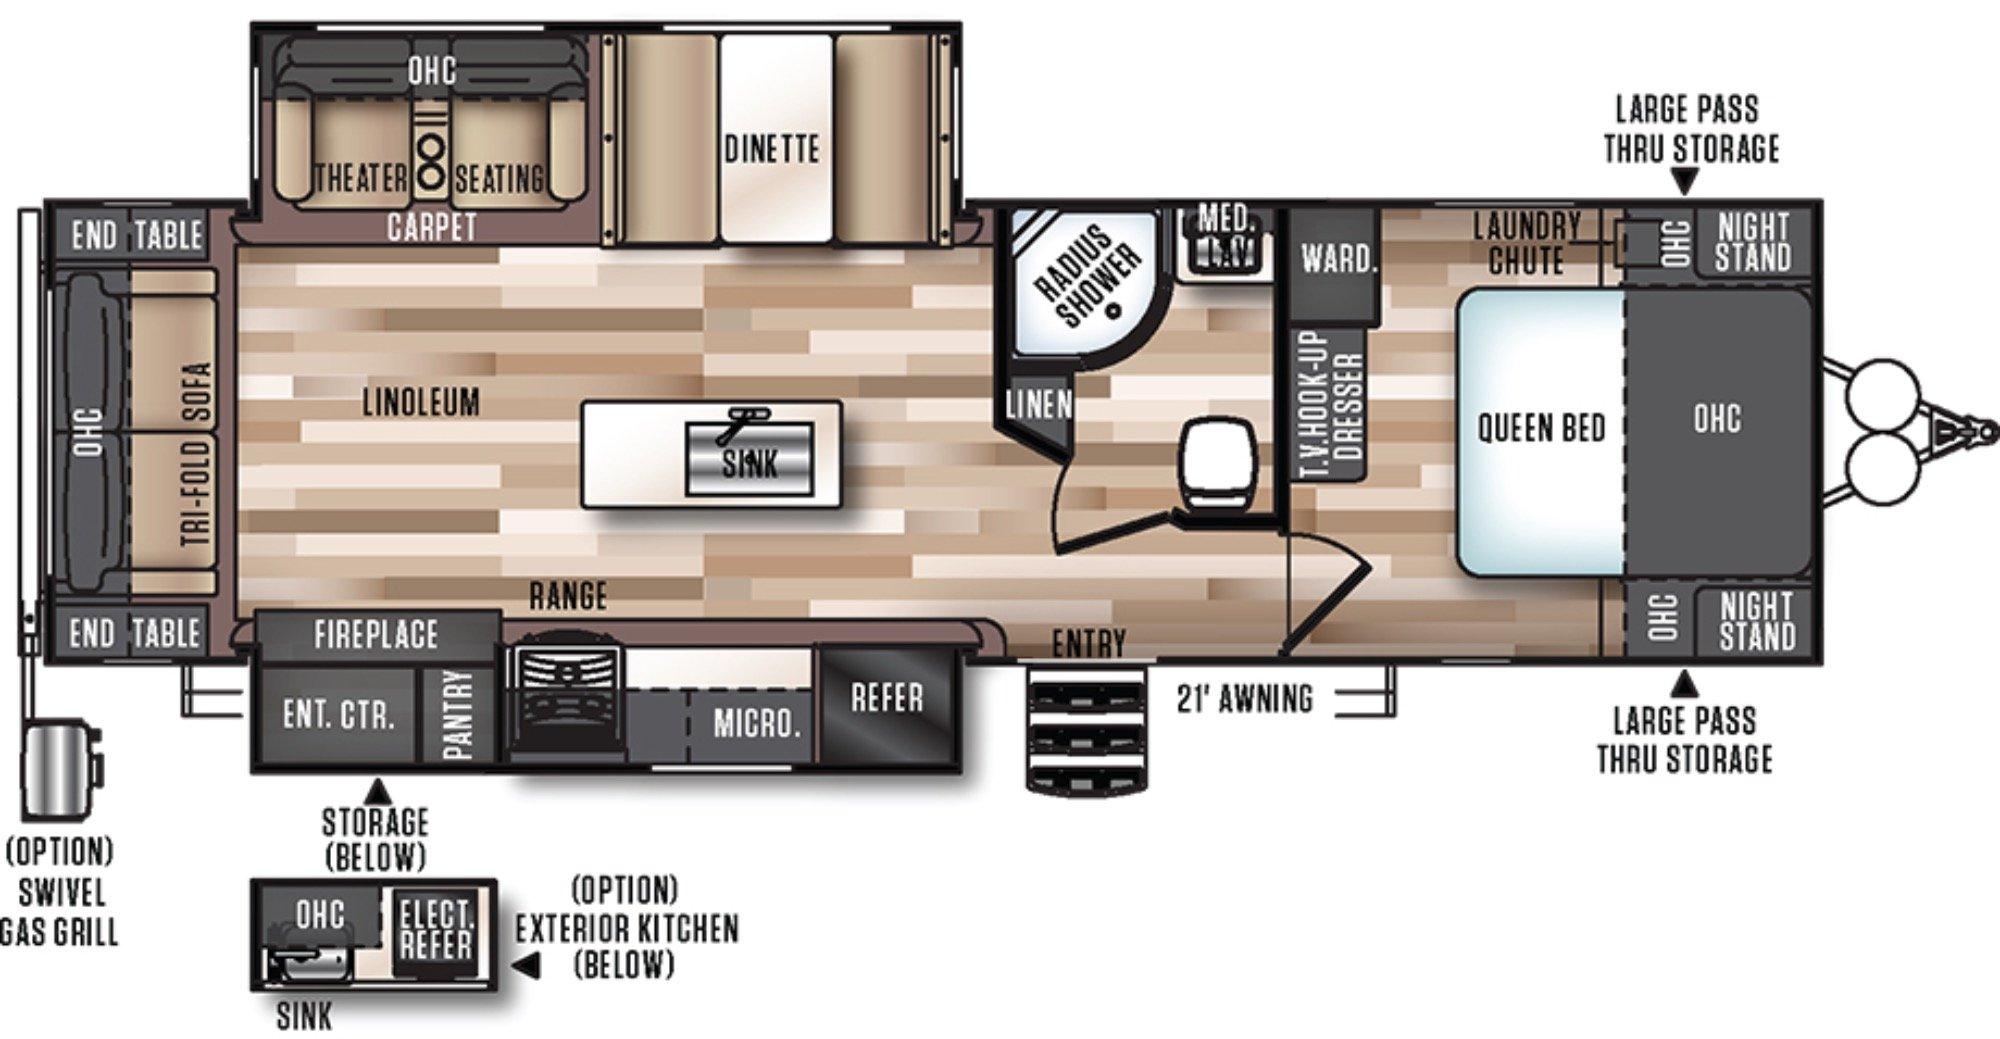 View Floor Plan for 2018 FOREST RIVER SALEM HEMISPHERE 272RL